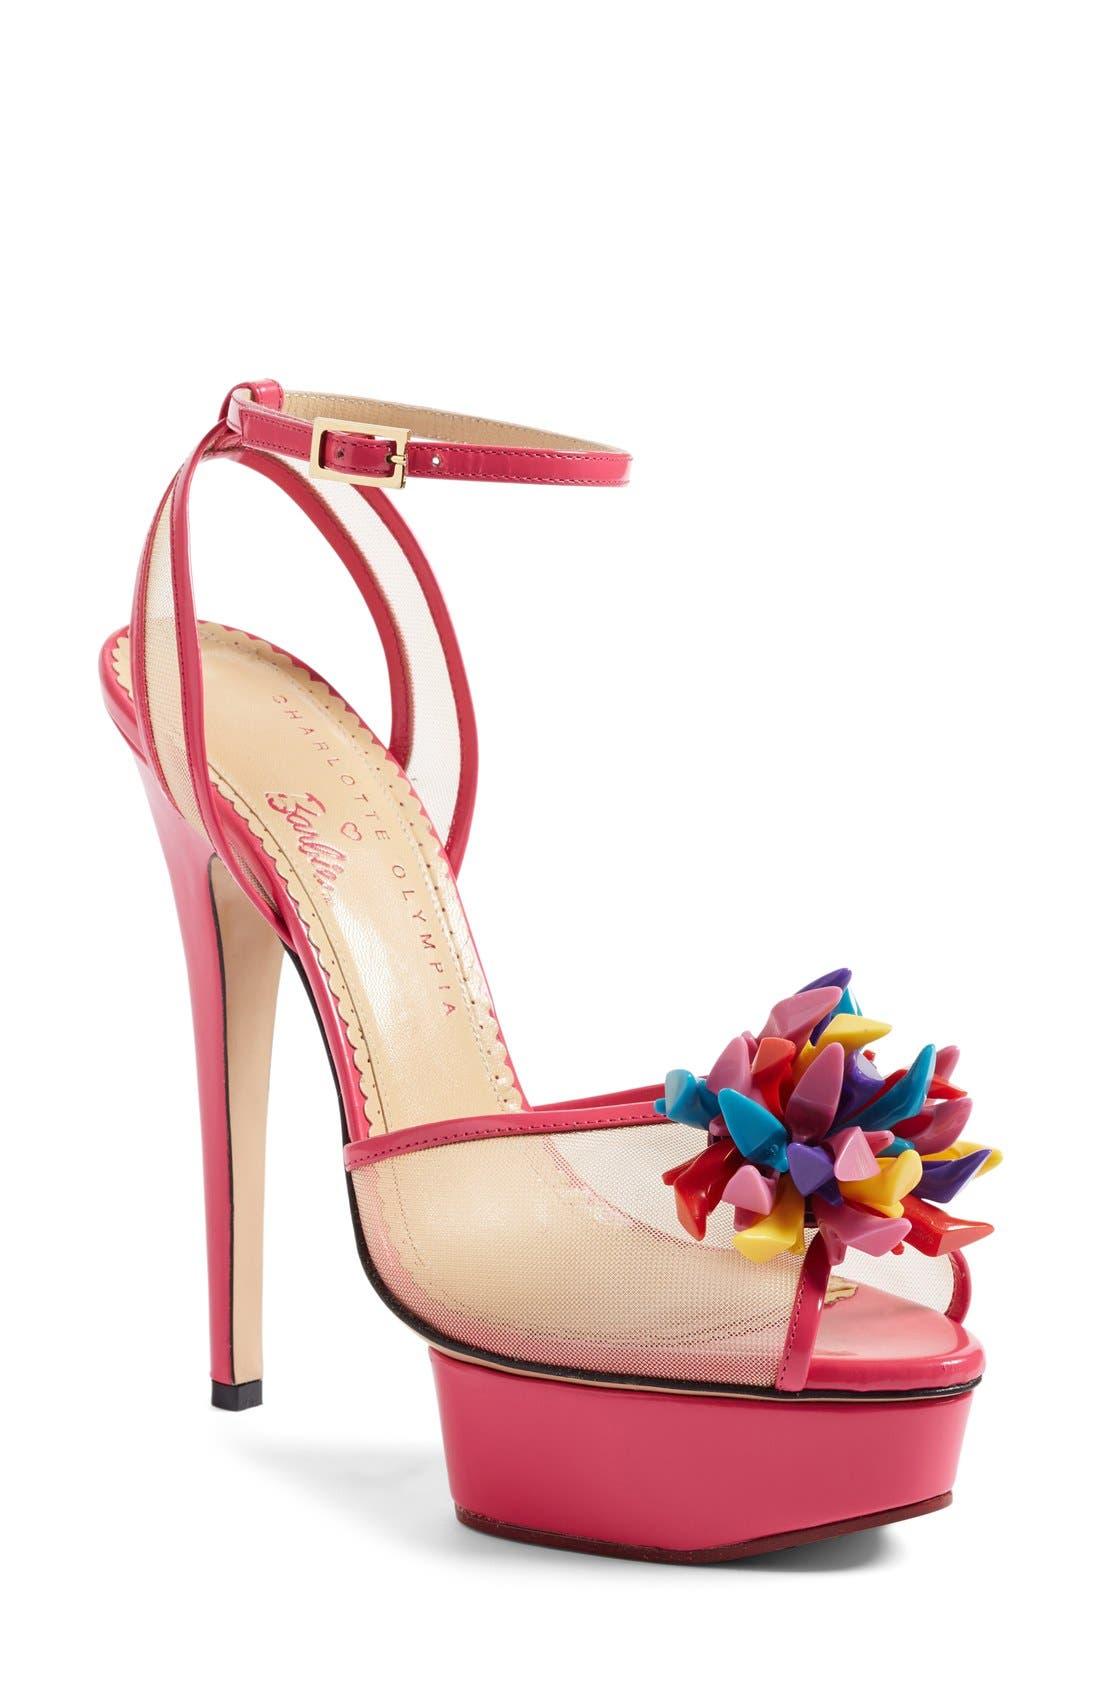 Alternate Image 1 Selected - Charlotte Olympia x Barbie® Pomeline Peep Toe Sandal (Women)